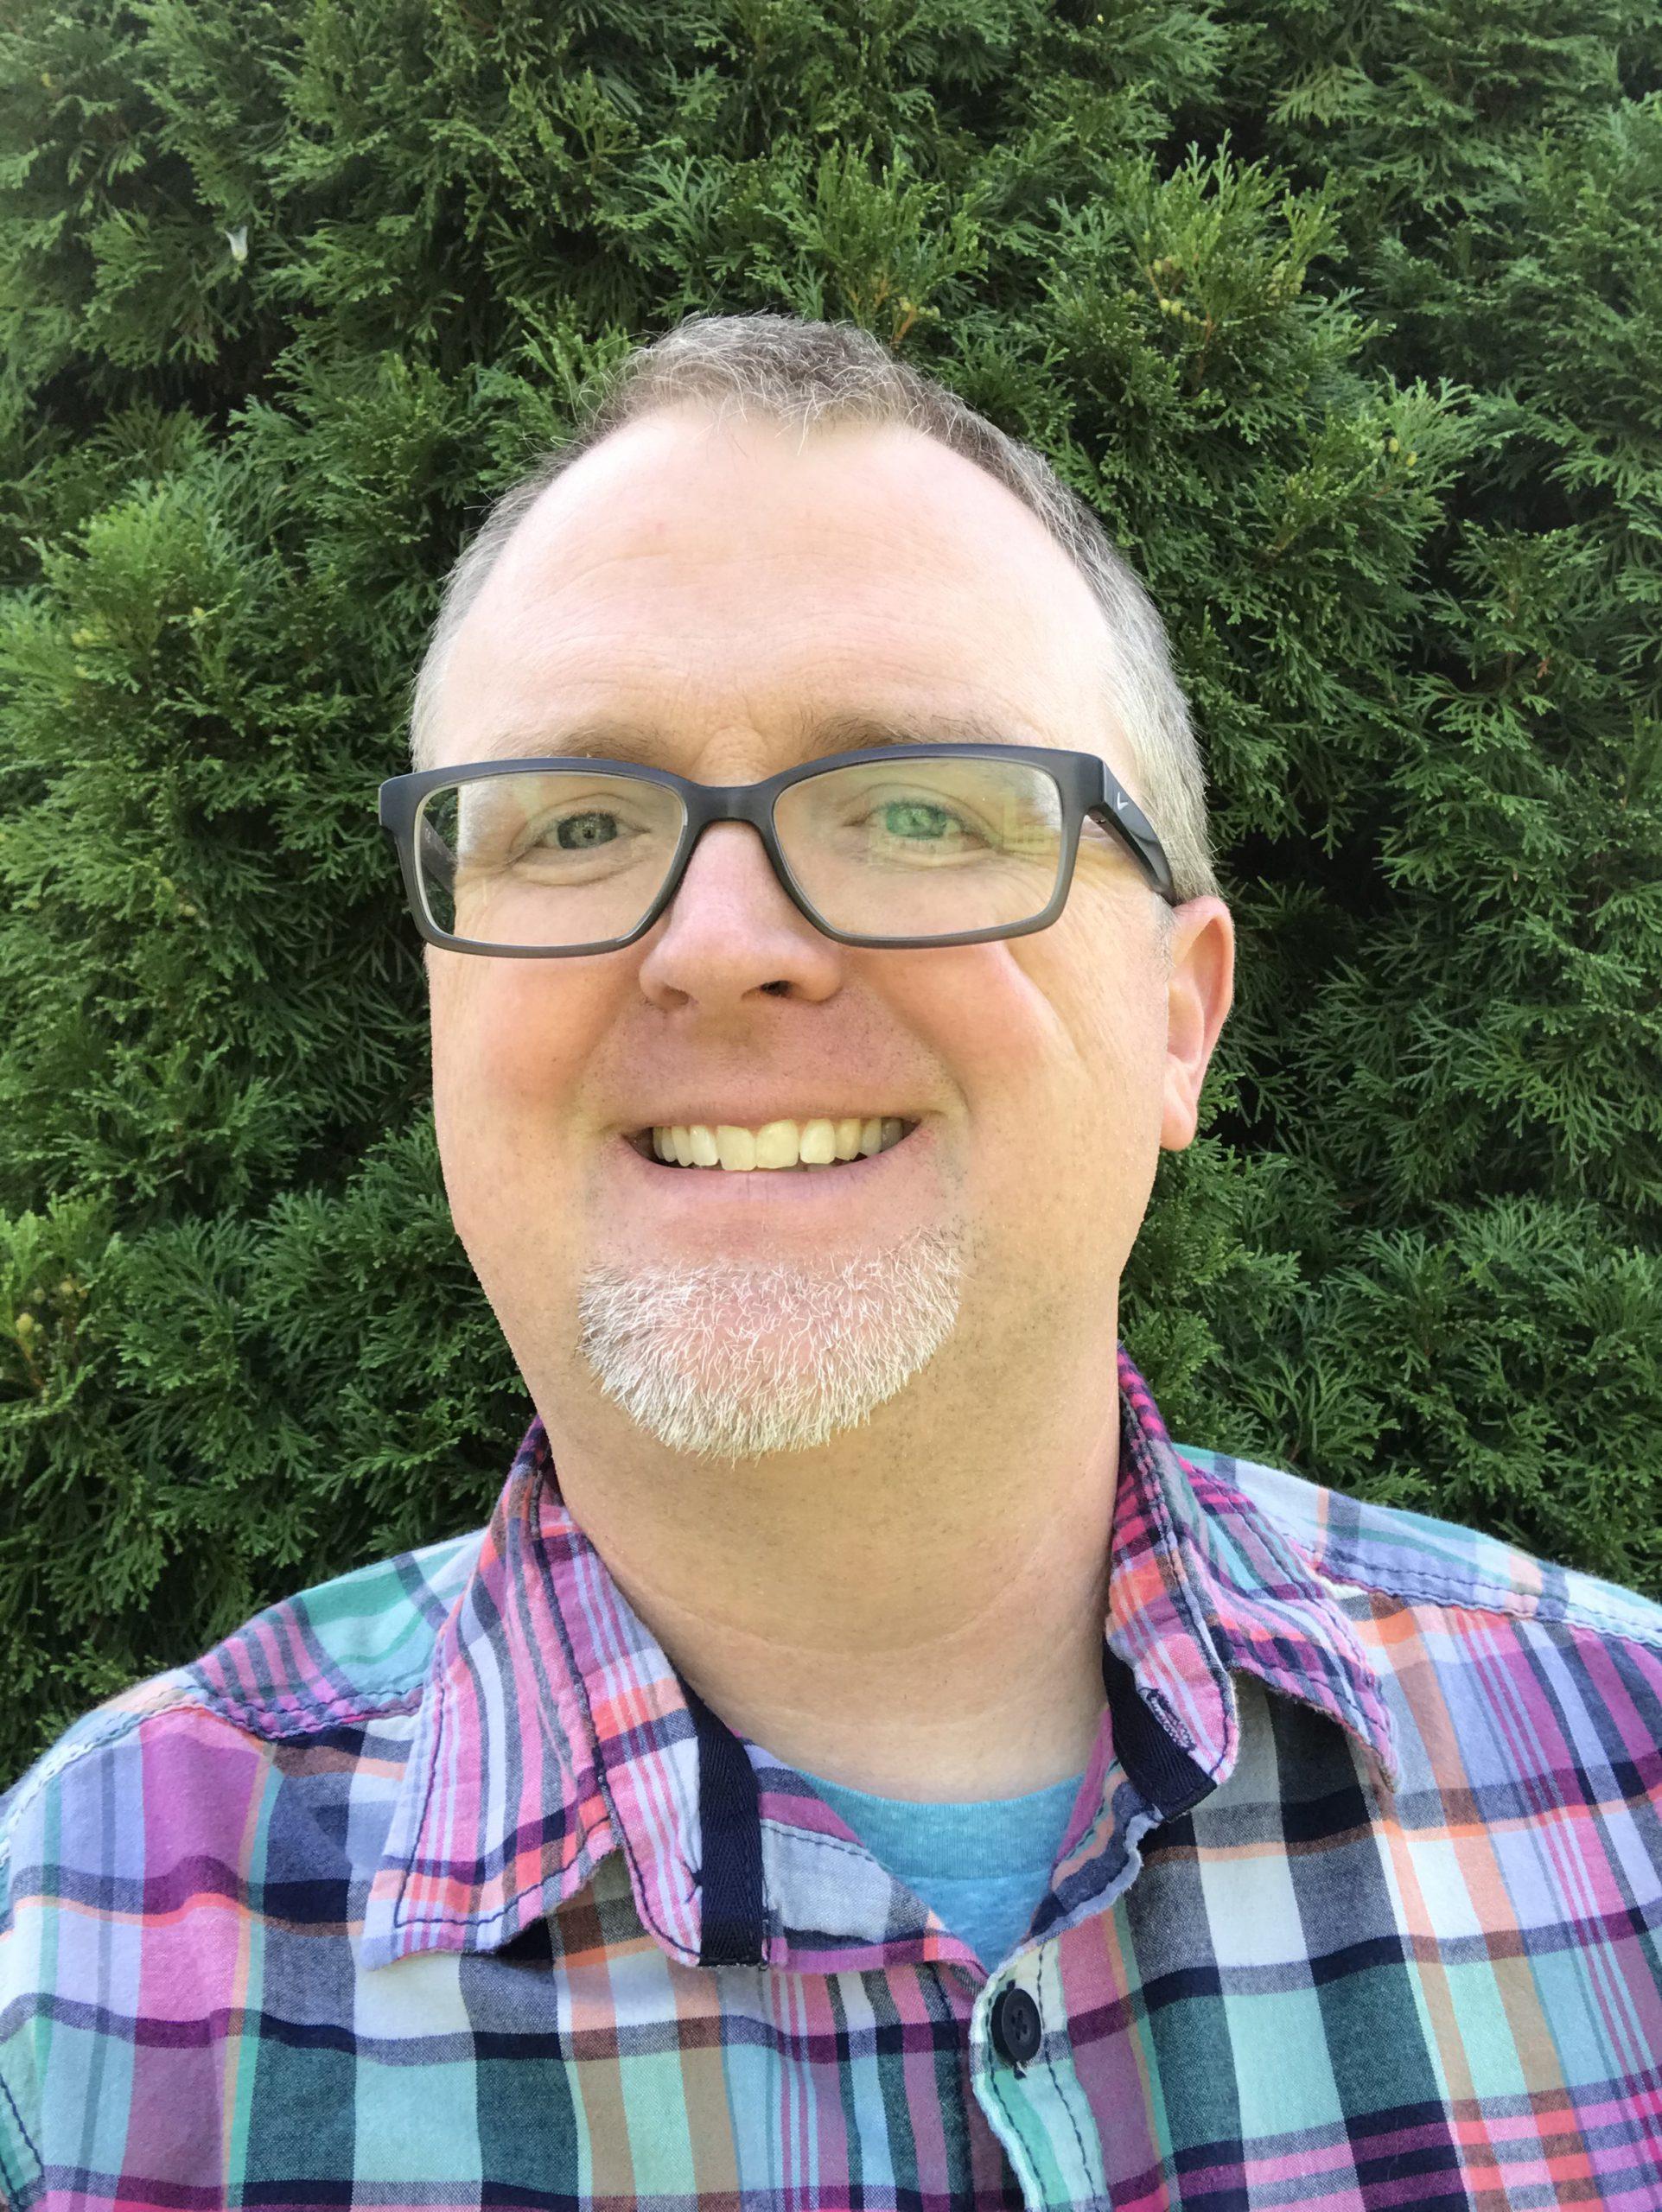 MEA member in Bridge: Educators innovating despite lack of federal support